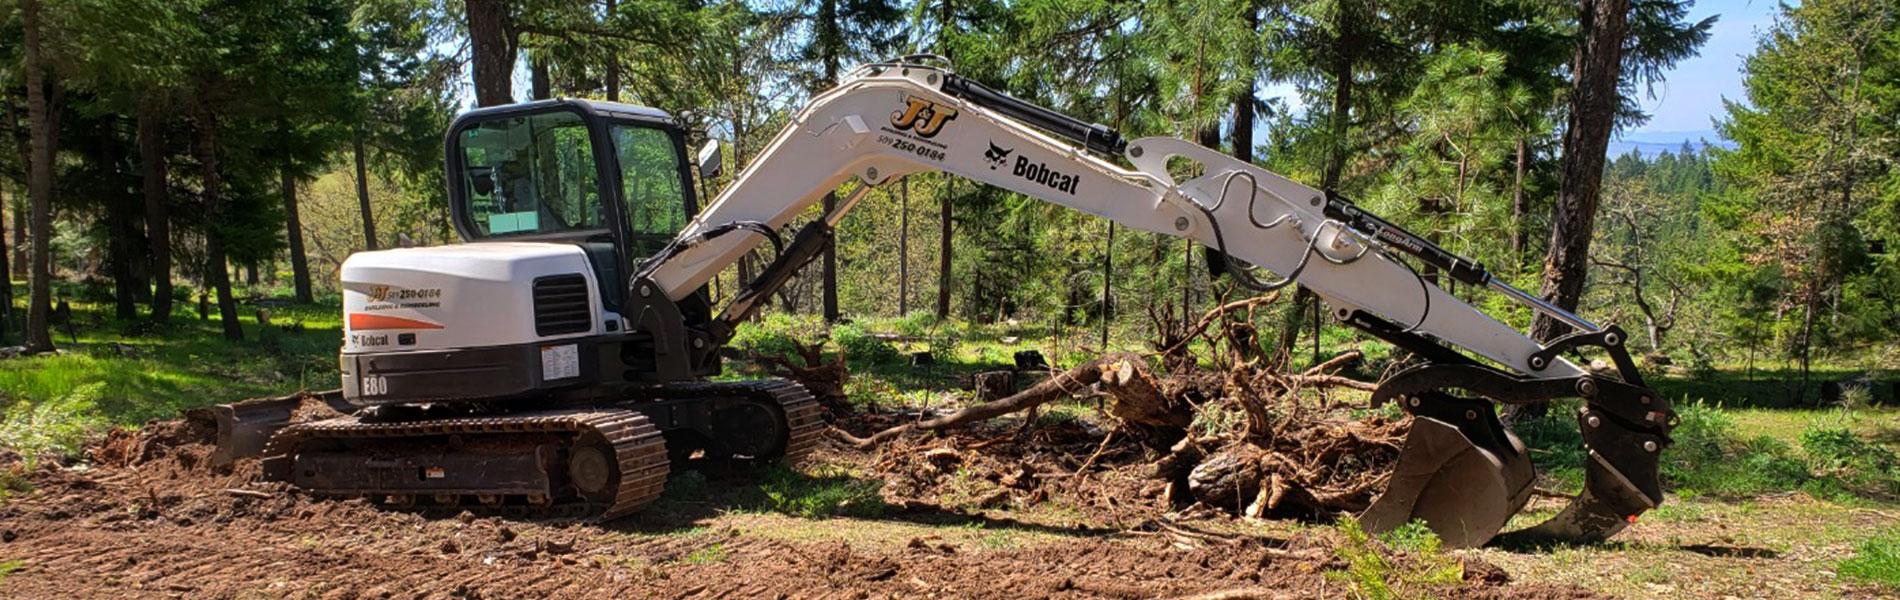 Excavator on the job in Klickitat, WA